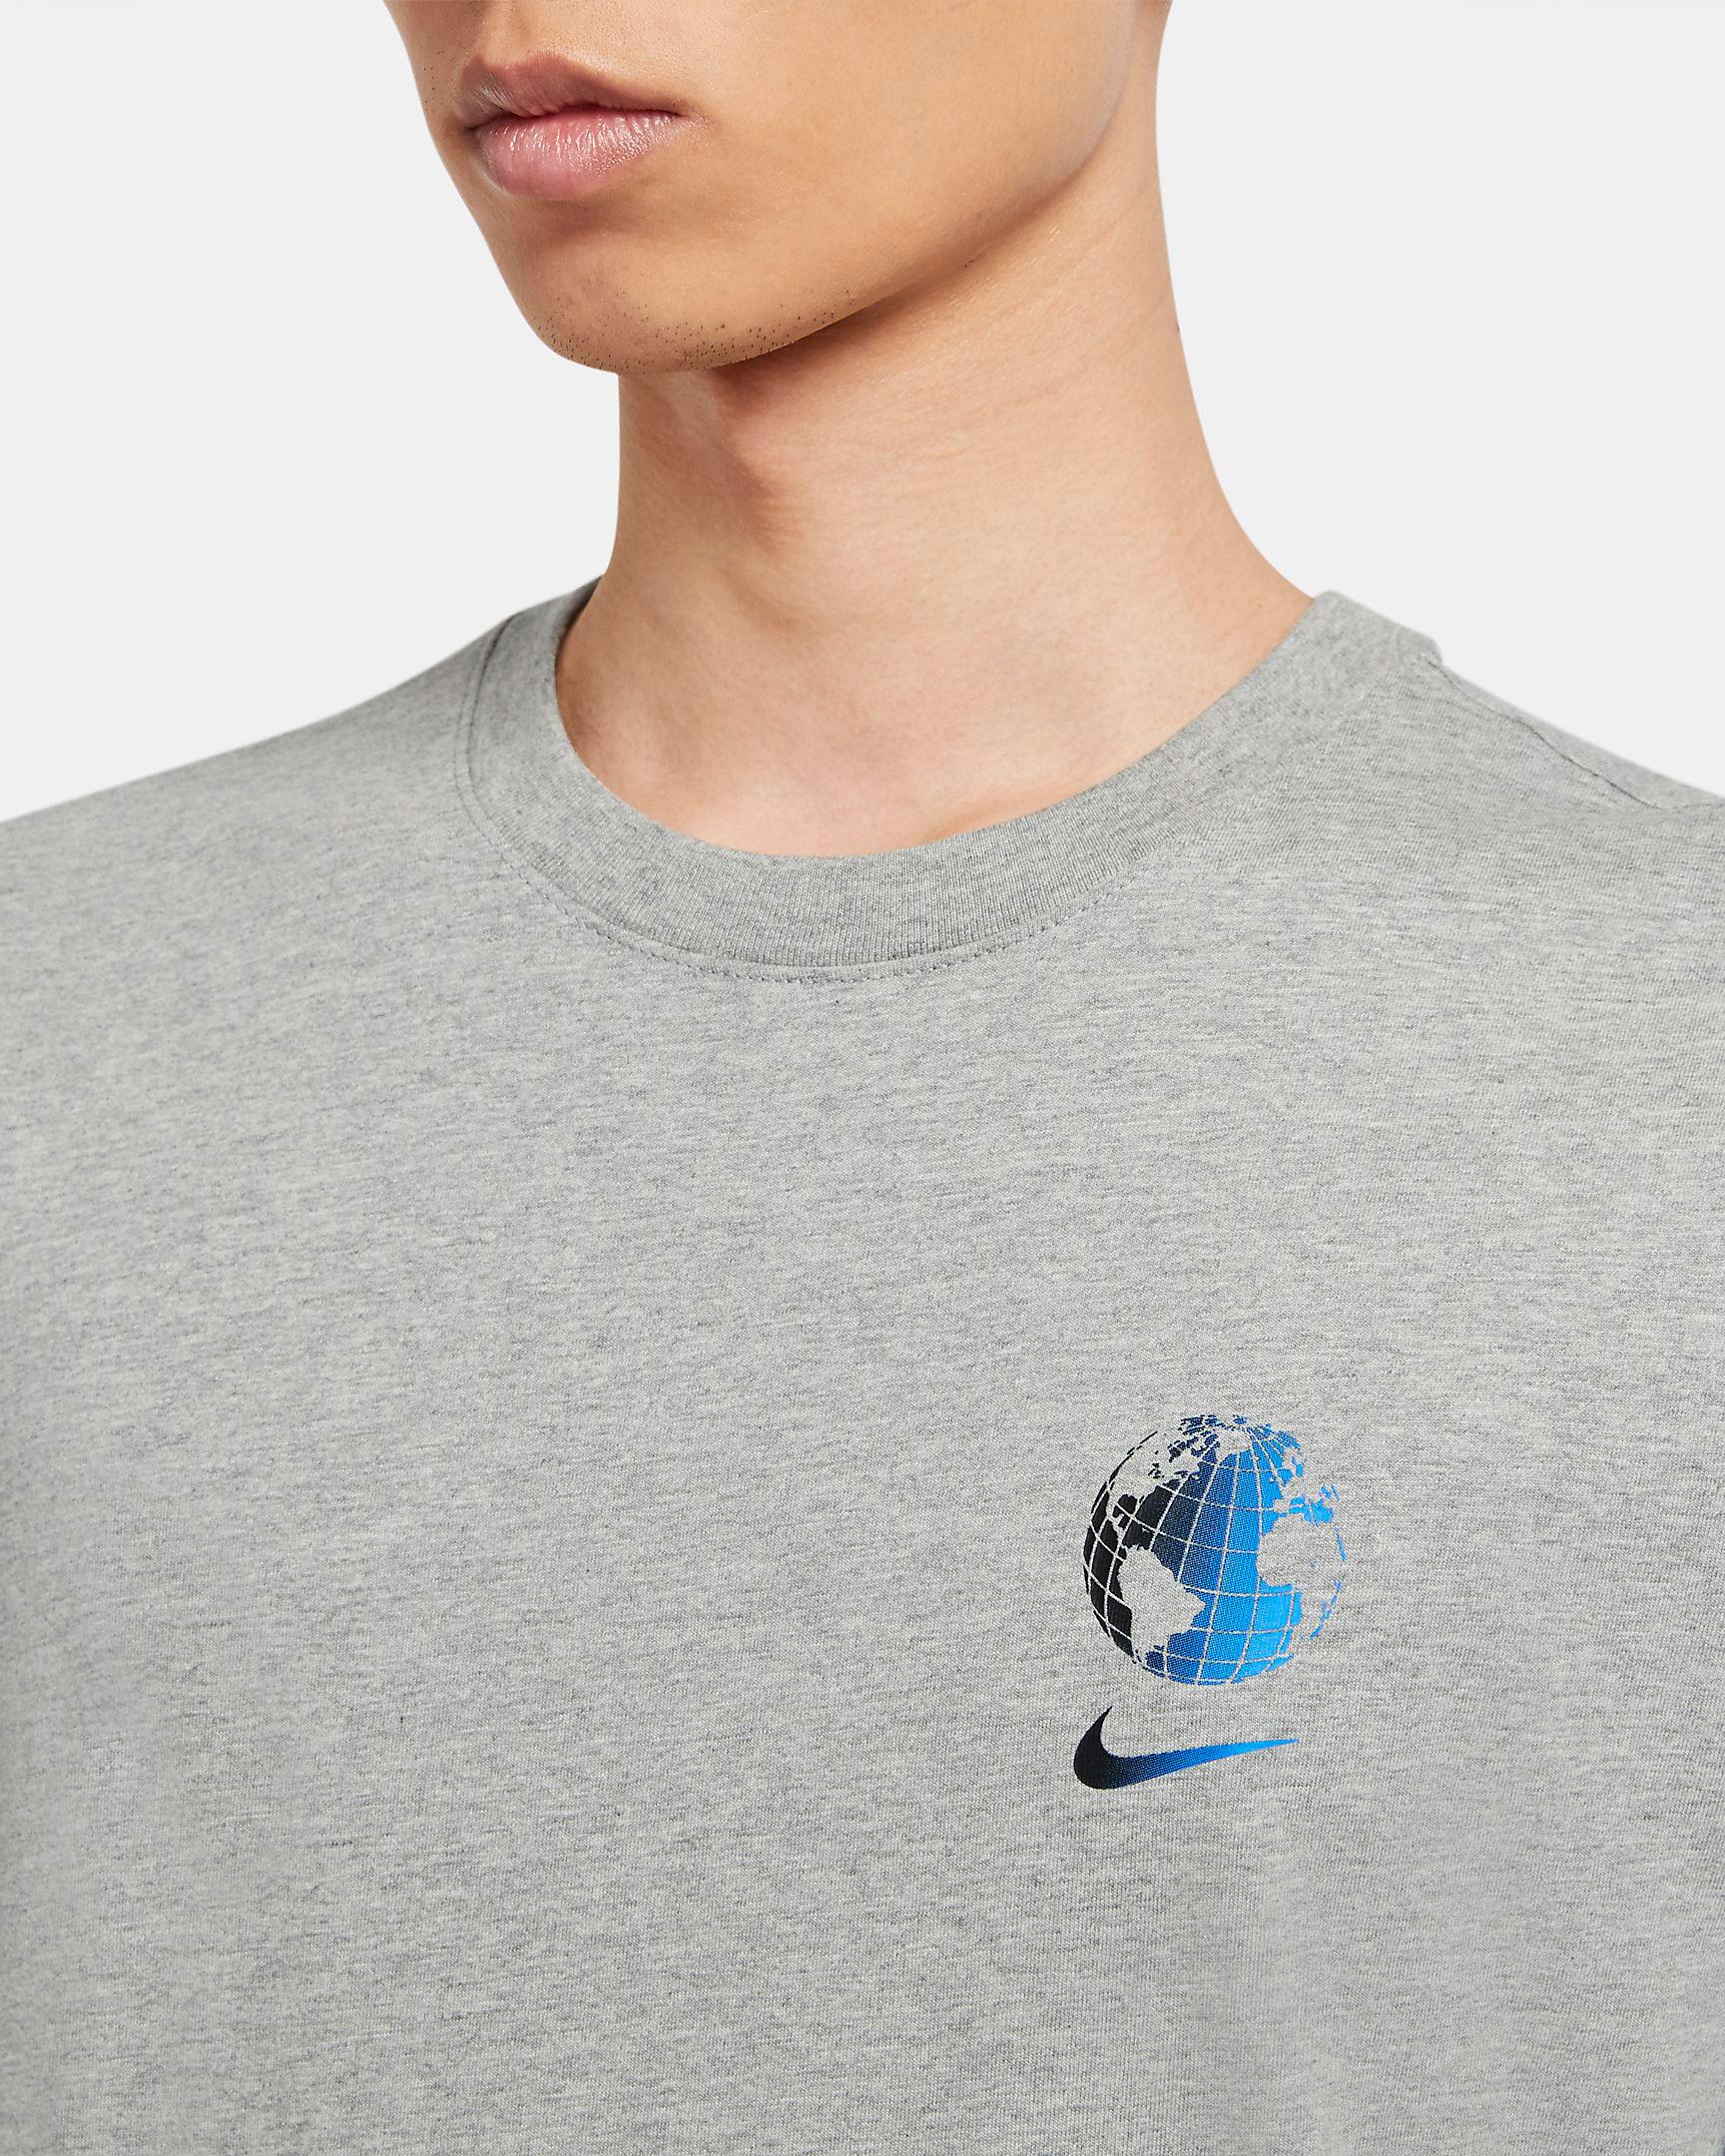 nike-pg-4-black-wolf-grey-blue-shirt-match-1